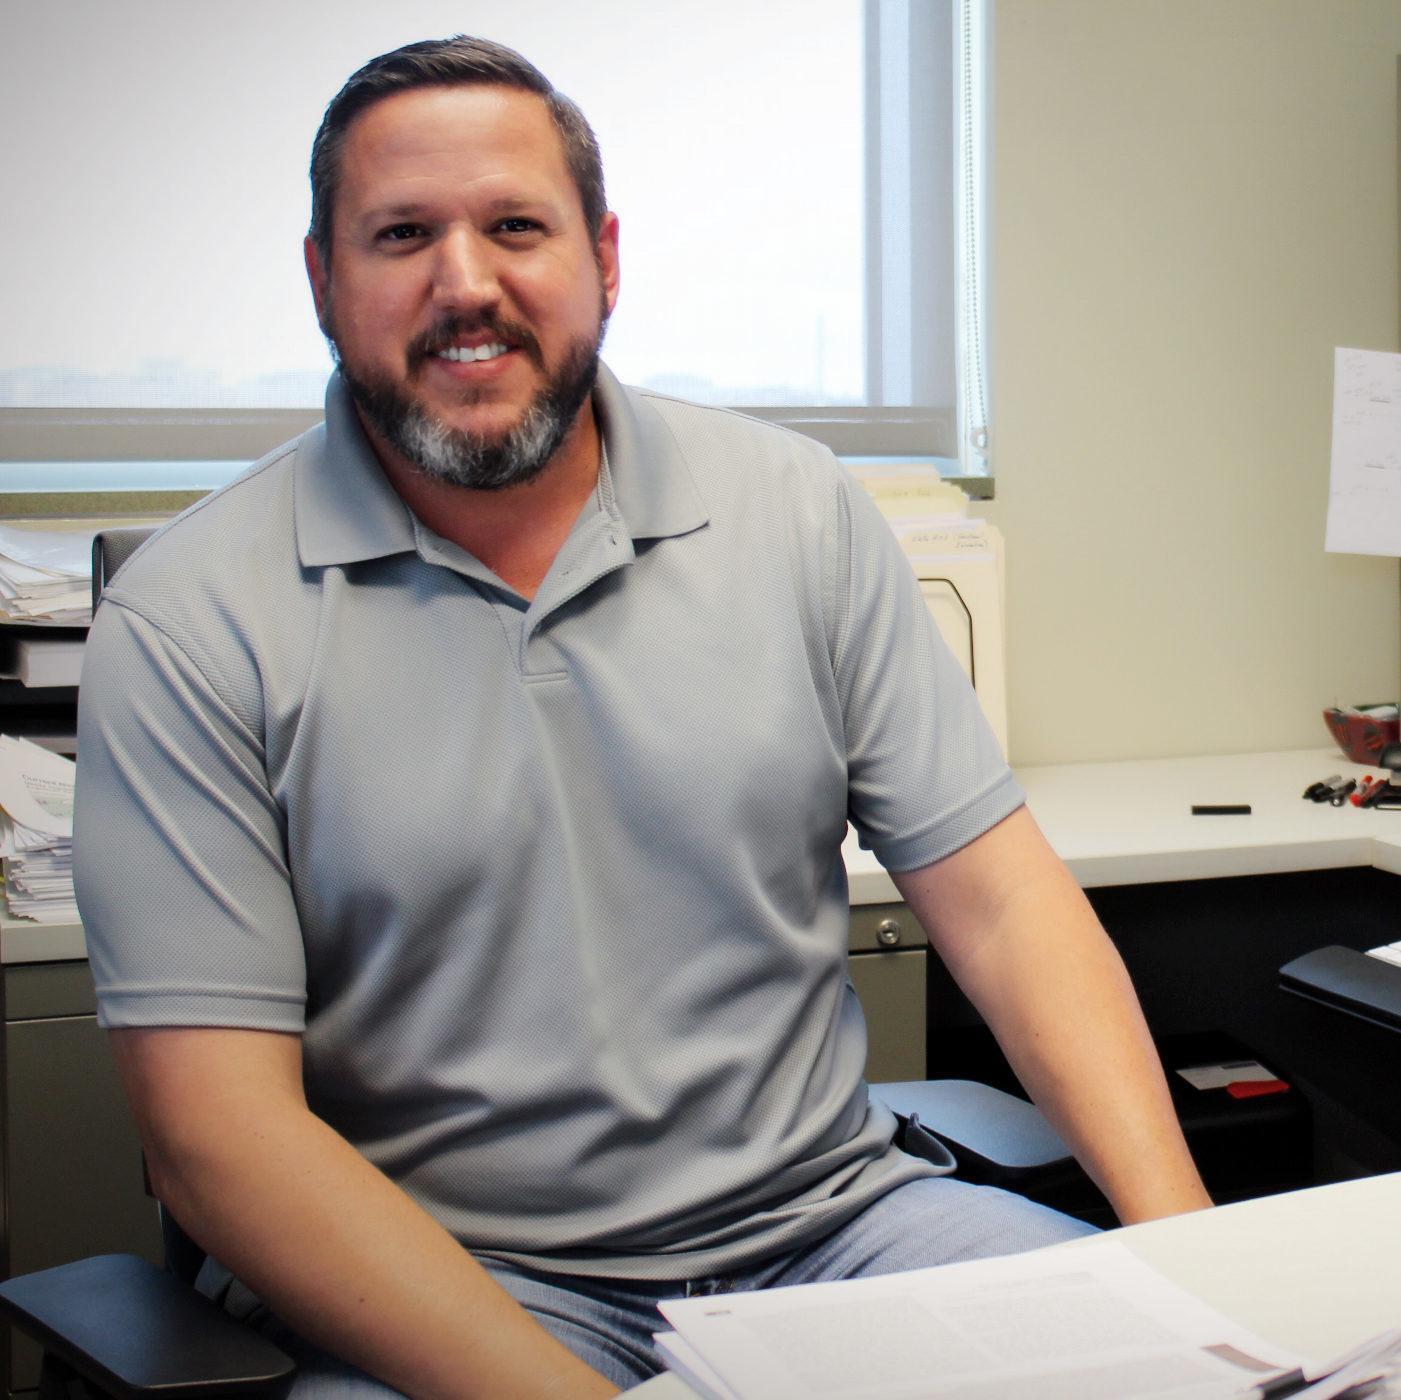 Scott Dindot, PhD